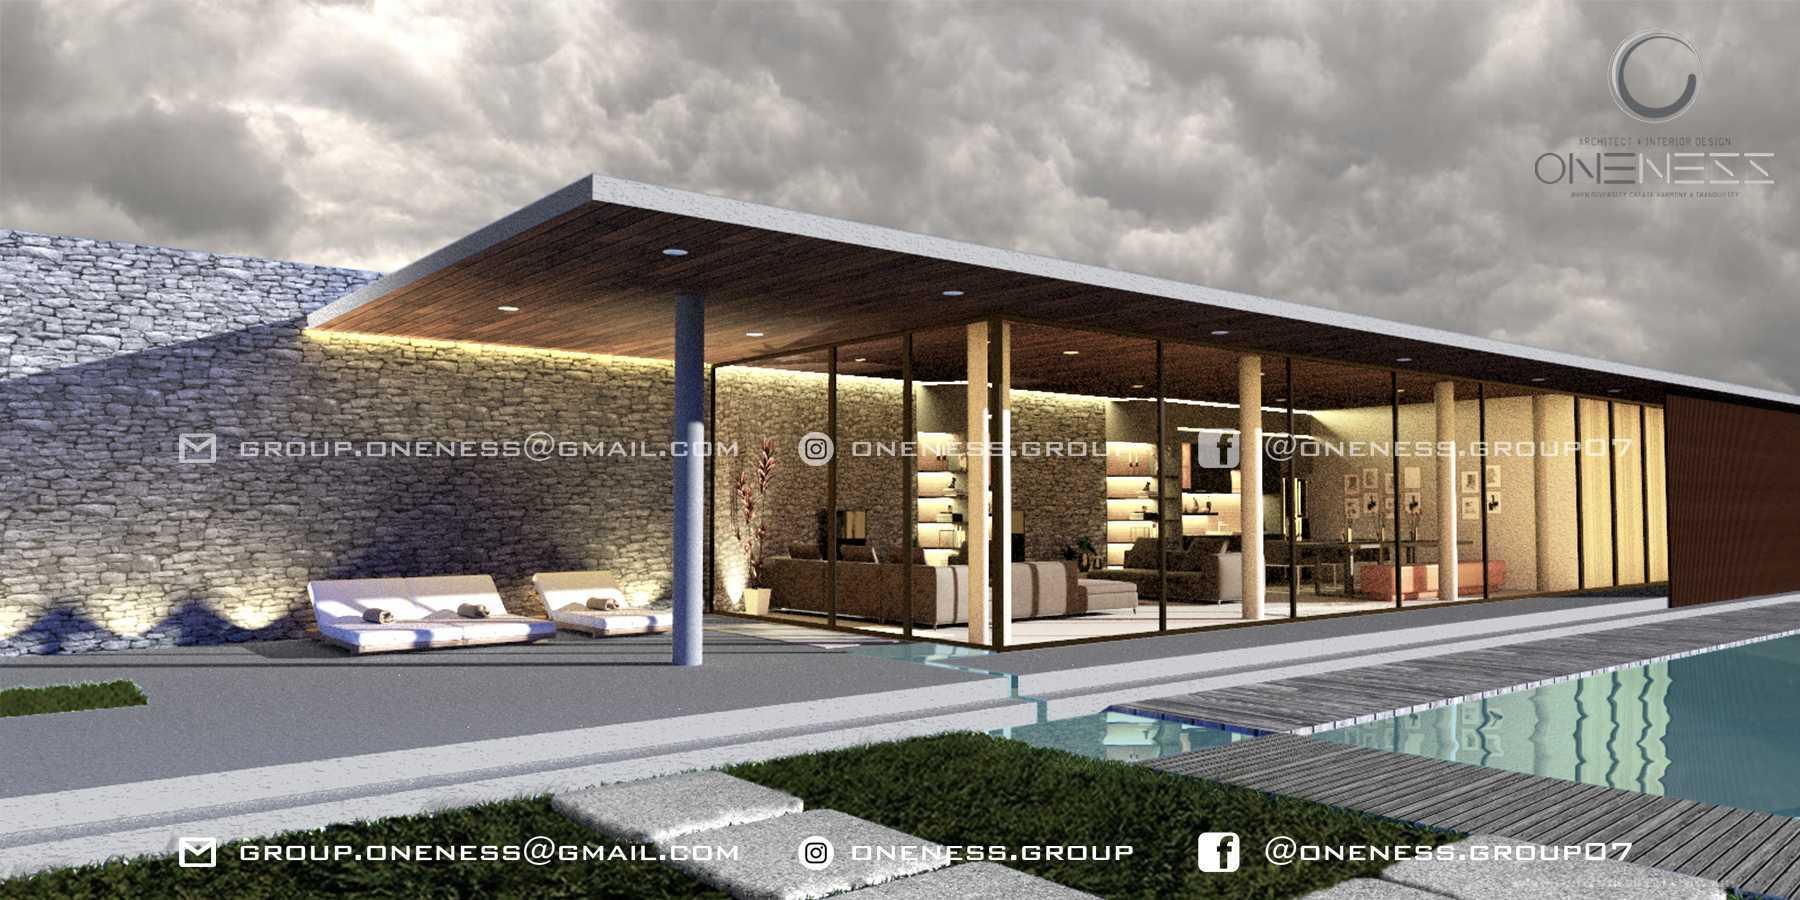 Oneness Group Villa Di Gunung Cirebon Cirebon, Kota Cirebon, Jawa Barat, Indonesia Cirebon, Kota Cirebon, Jawa Barat, Indonesia Eksterior Villa Di Gunung  98227